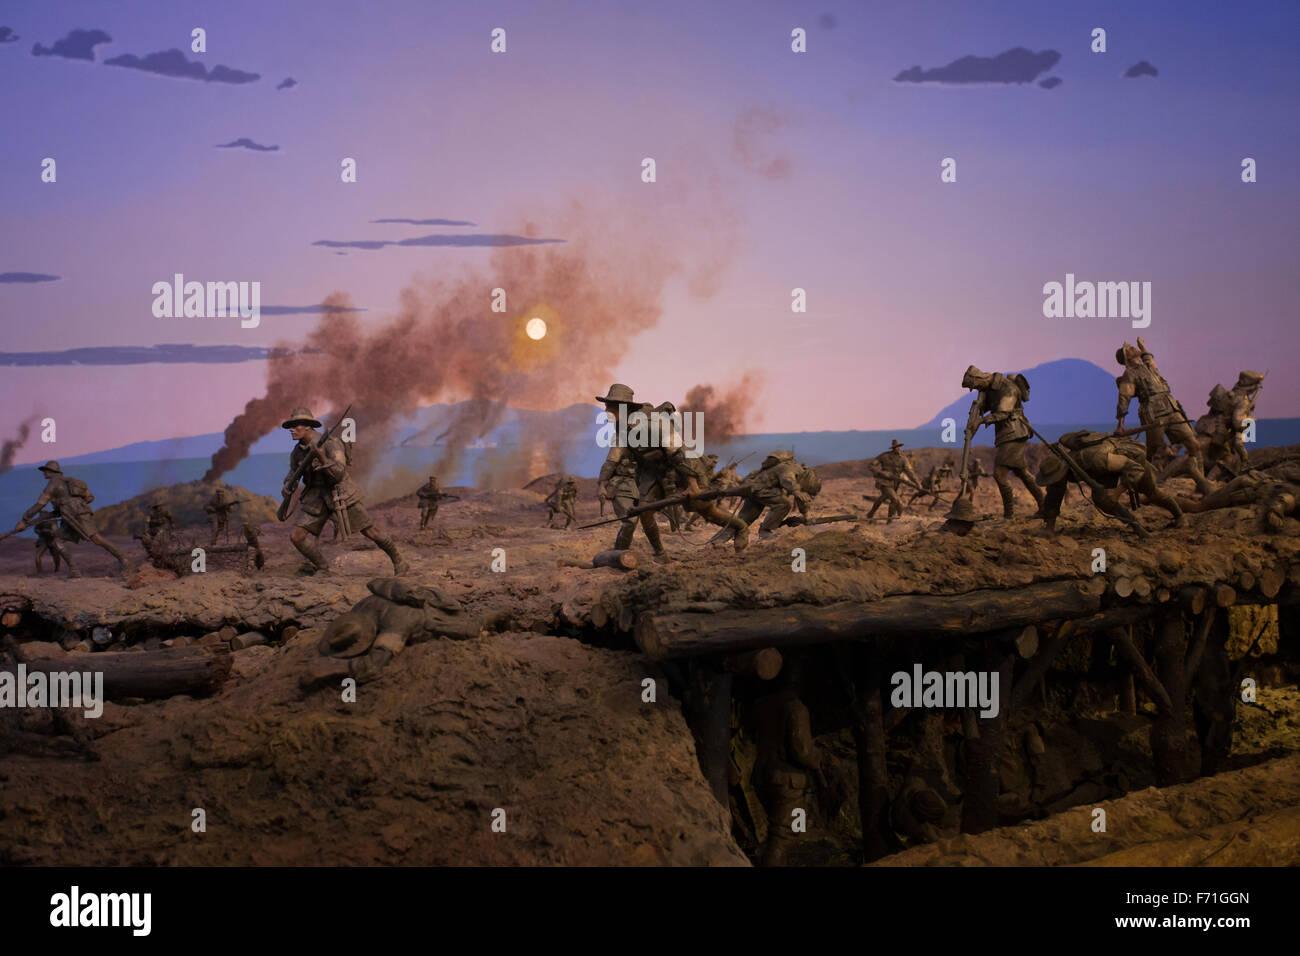 battle scene recreation - Stock Image